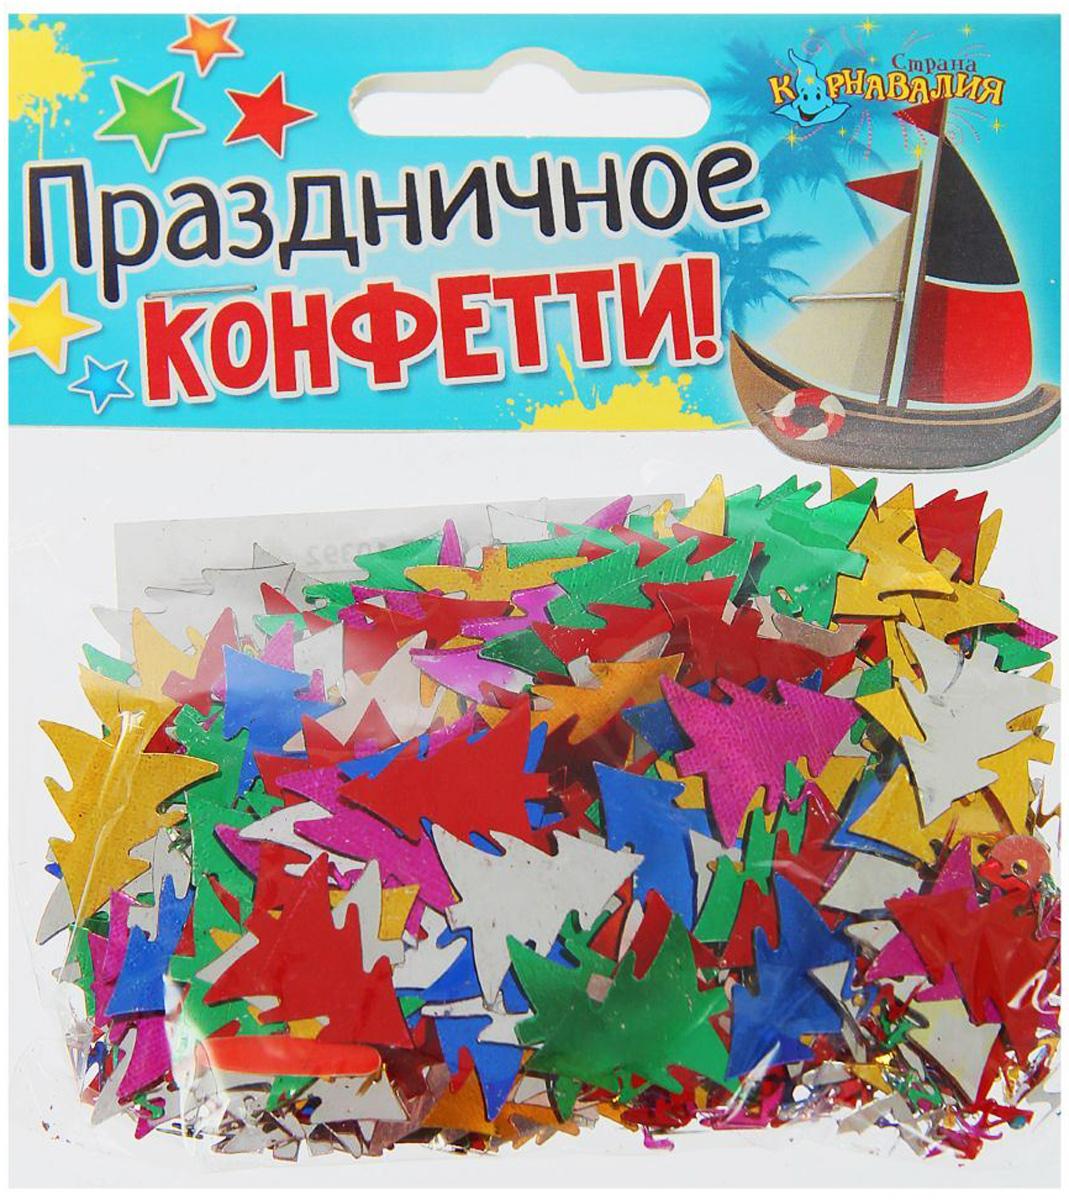 Конфетти Страна Карнавалия  Праздничное конфетти. Елочки , 14 г -  Конфетти